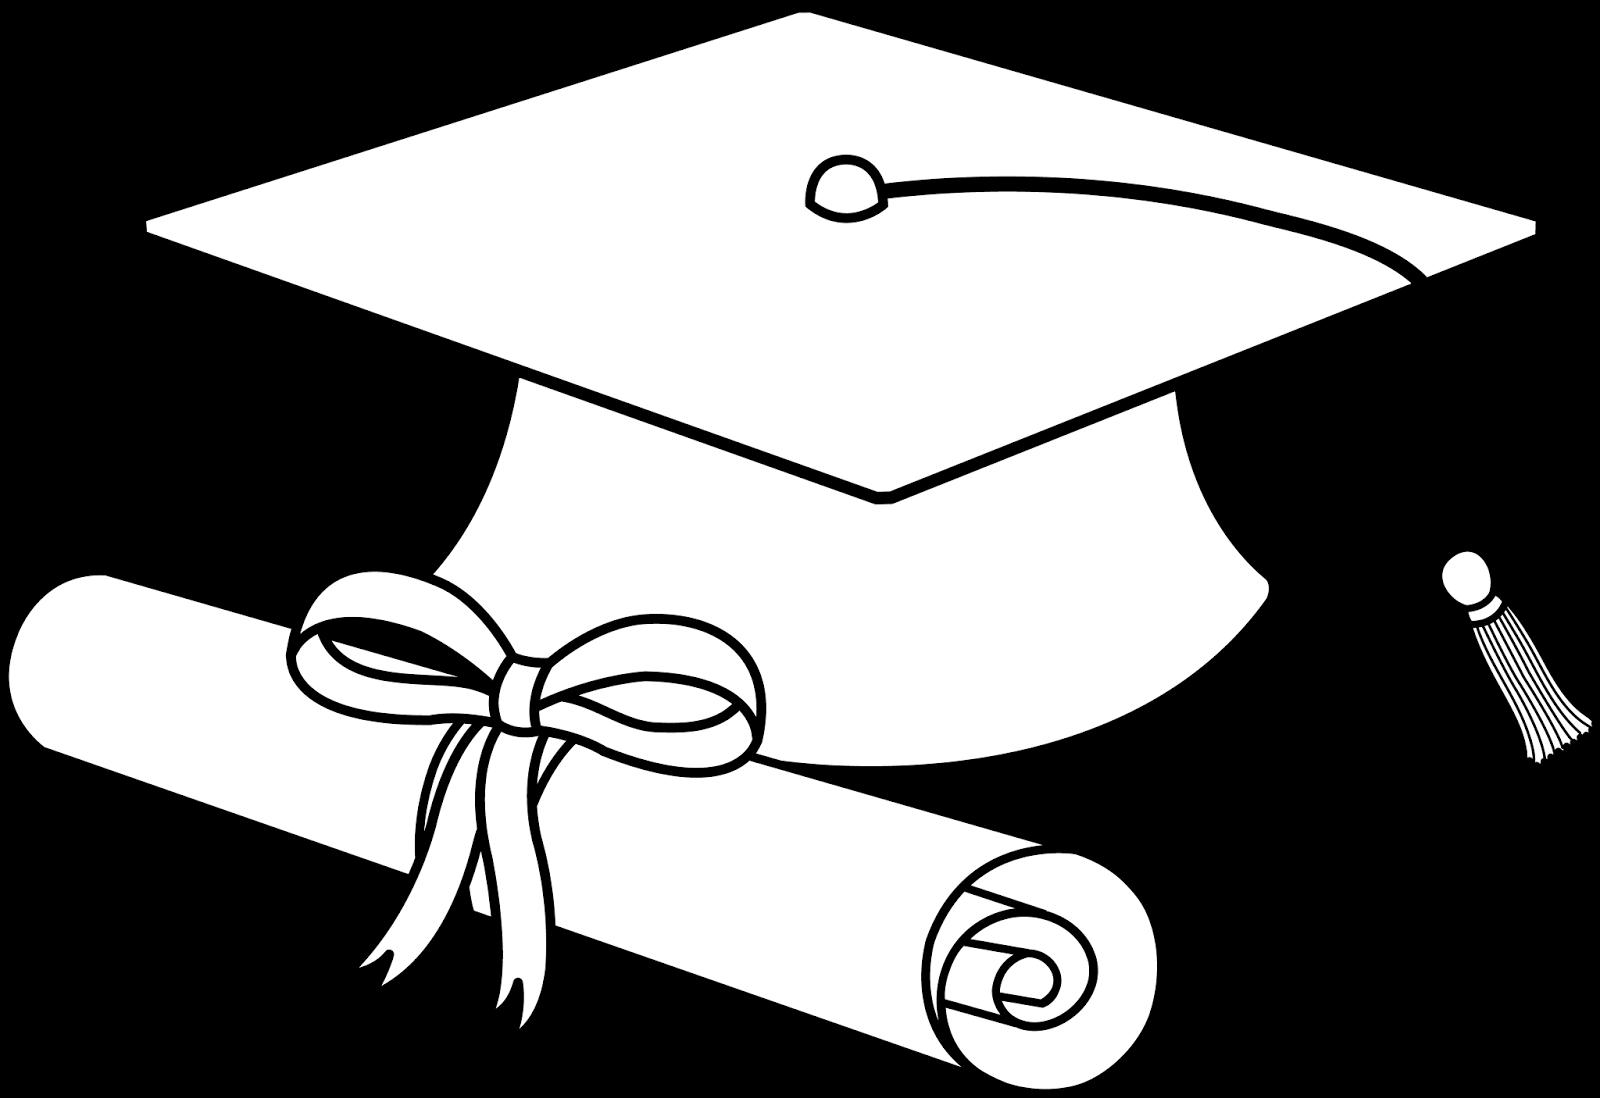 Diploma clipart toga. Daftar judul tadris bahasa